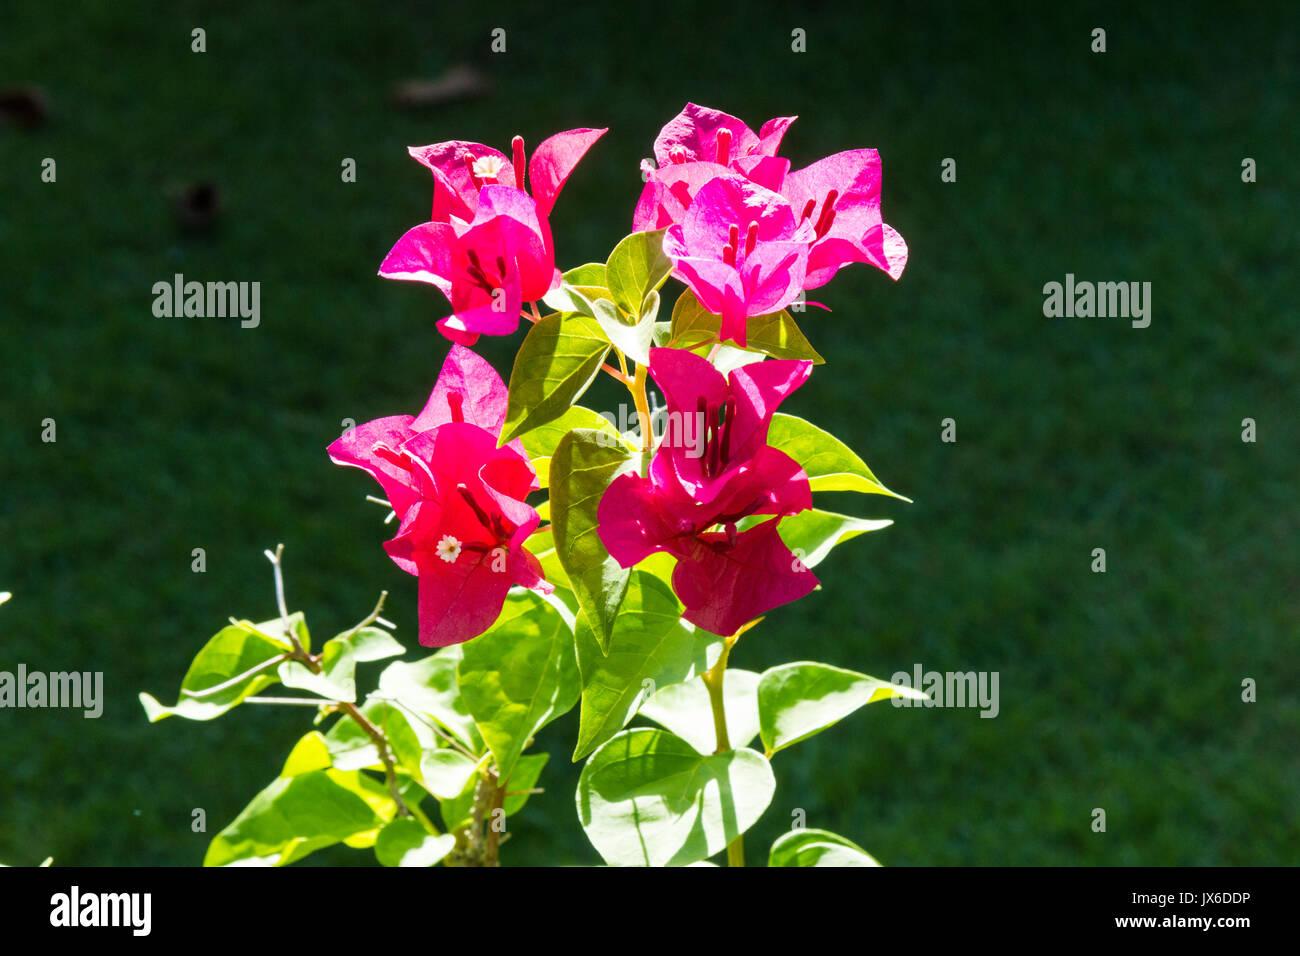 Pink bougainvillea flowers on a garden shrub - Stock Image